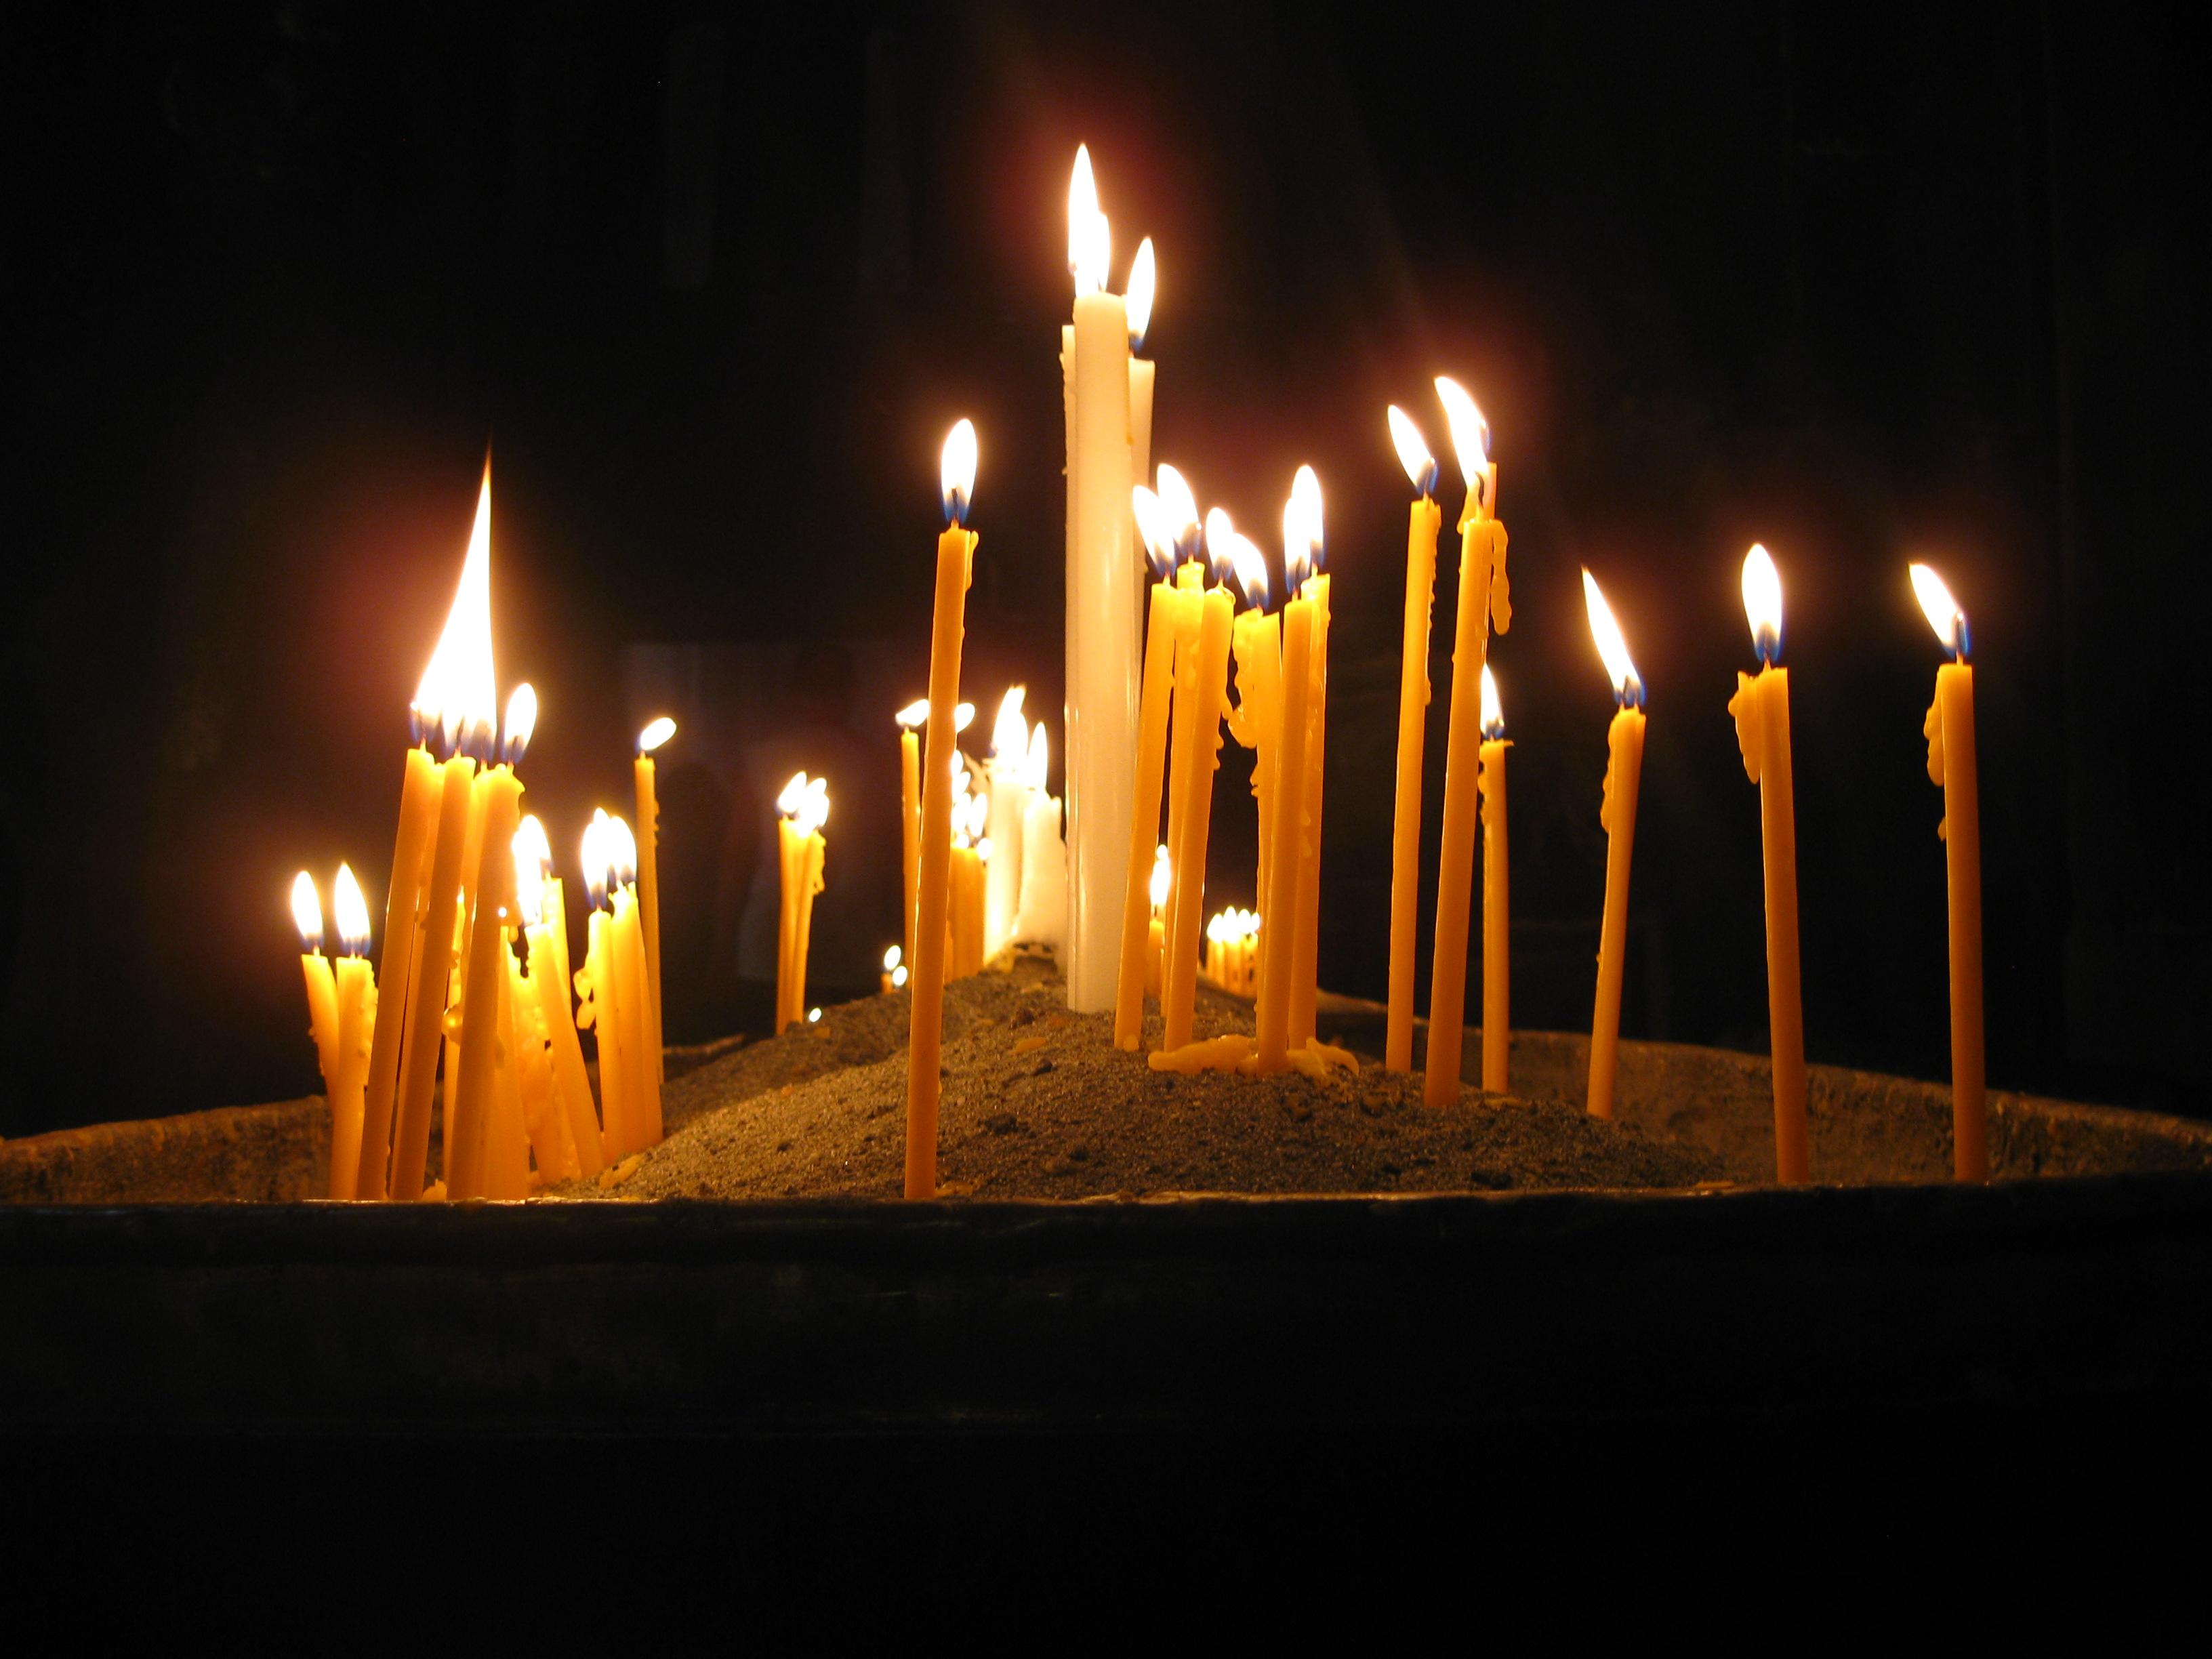 Фото девушка в церкви со свечой